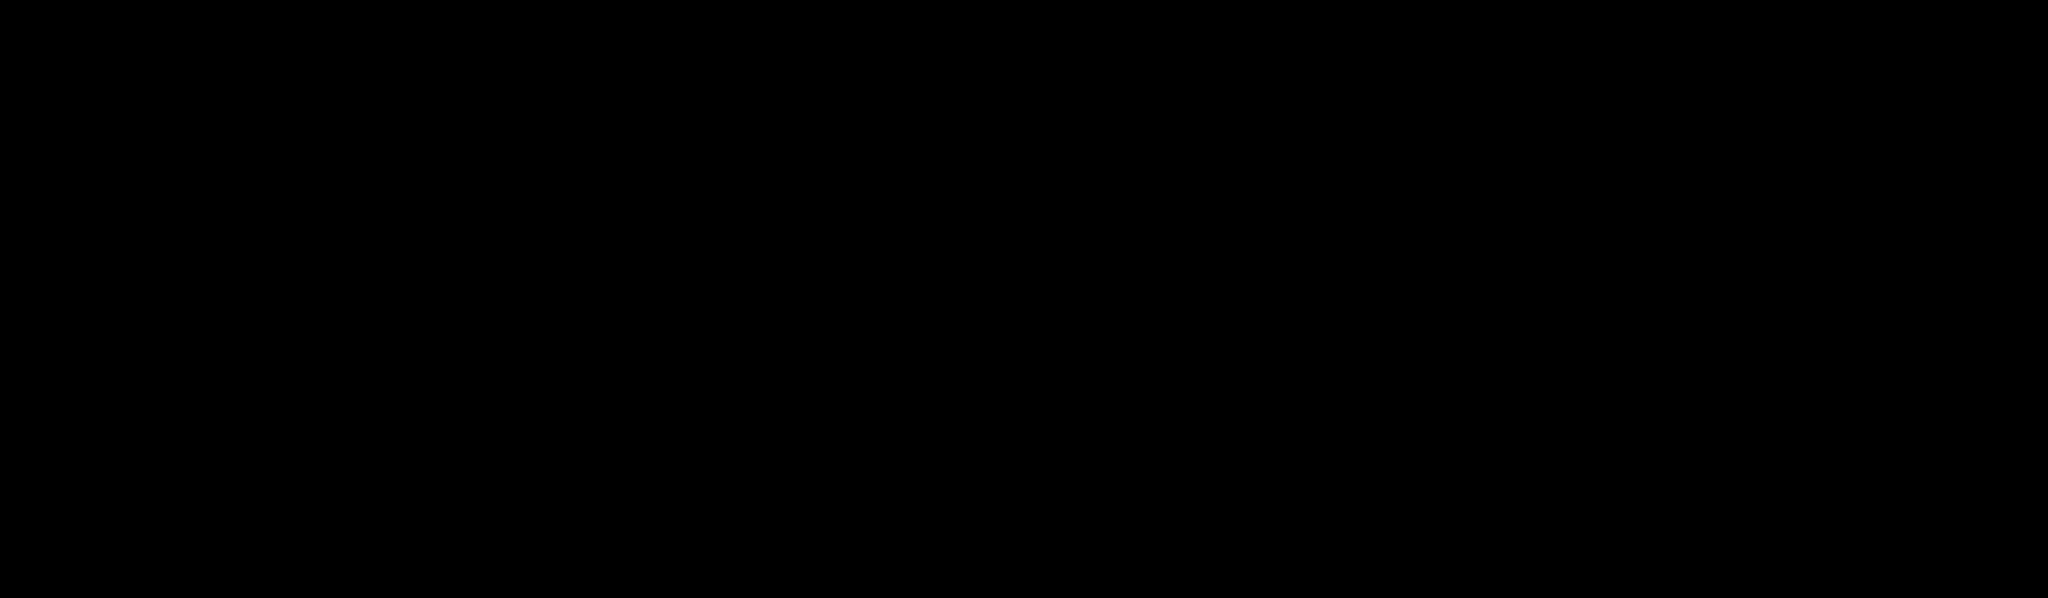 ohsofa-logo